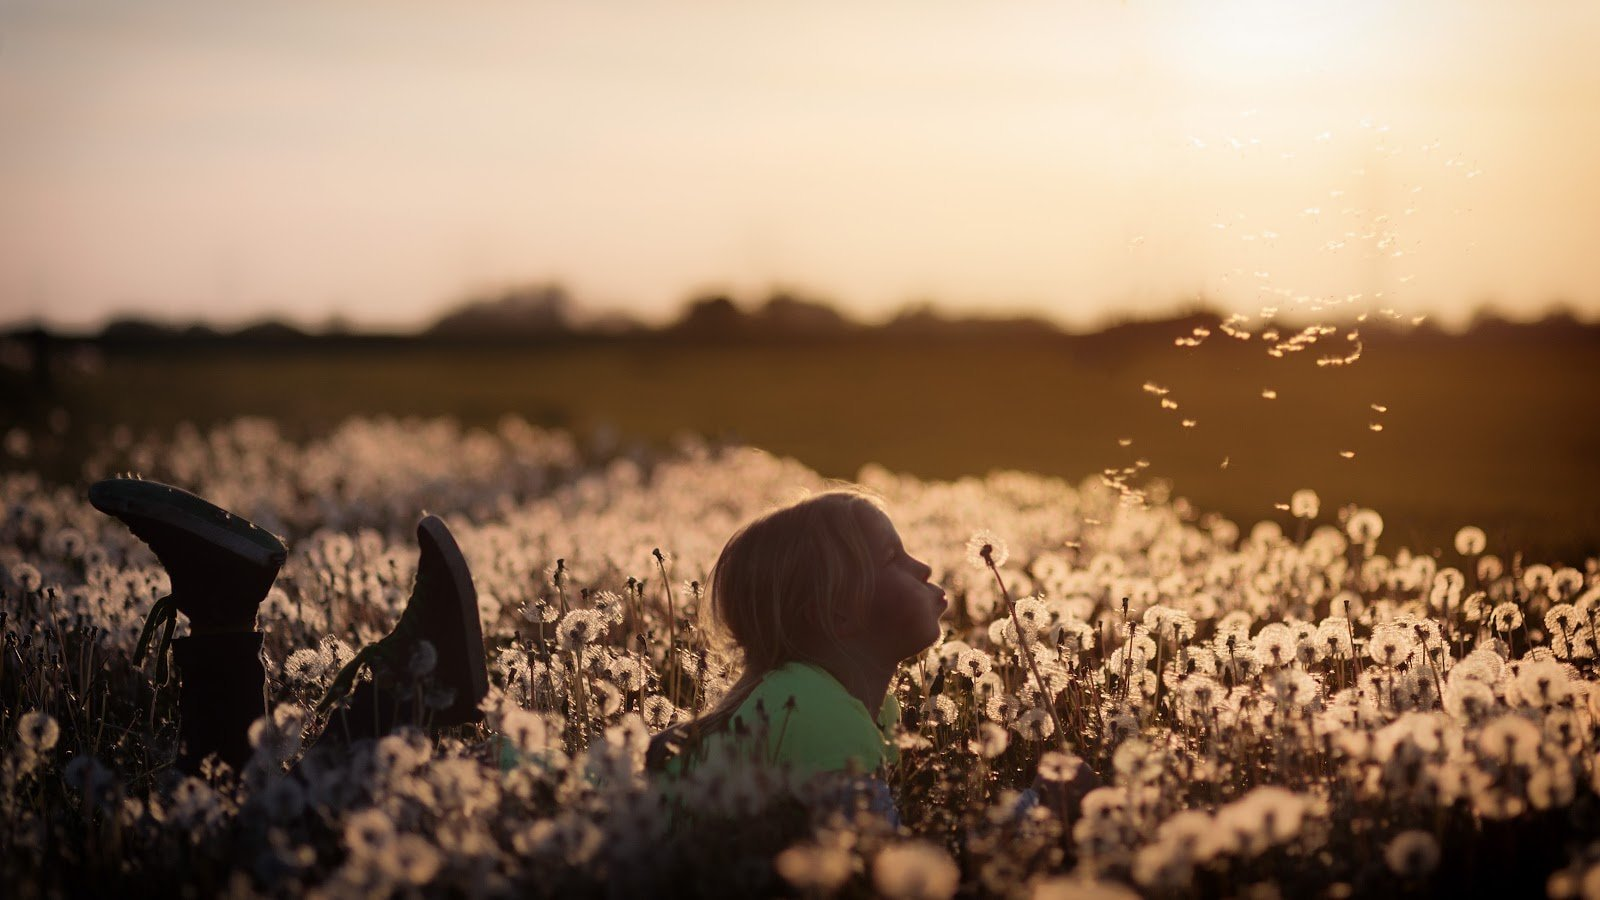 A girl blowing on a dandelion photo by Johannes Plenio